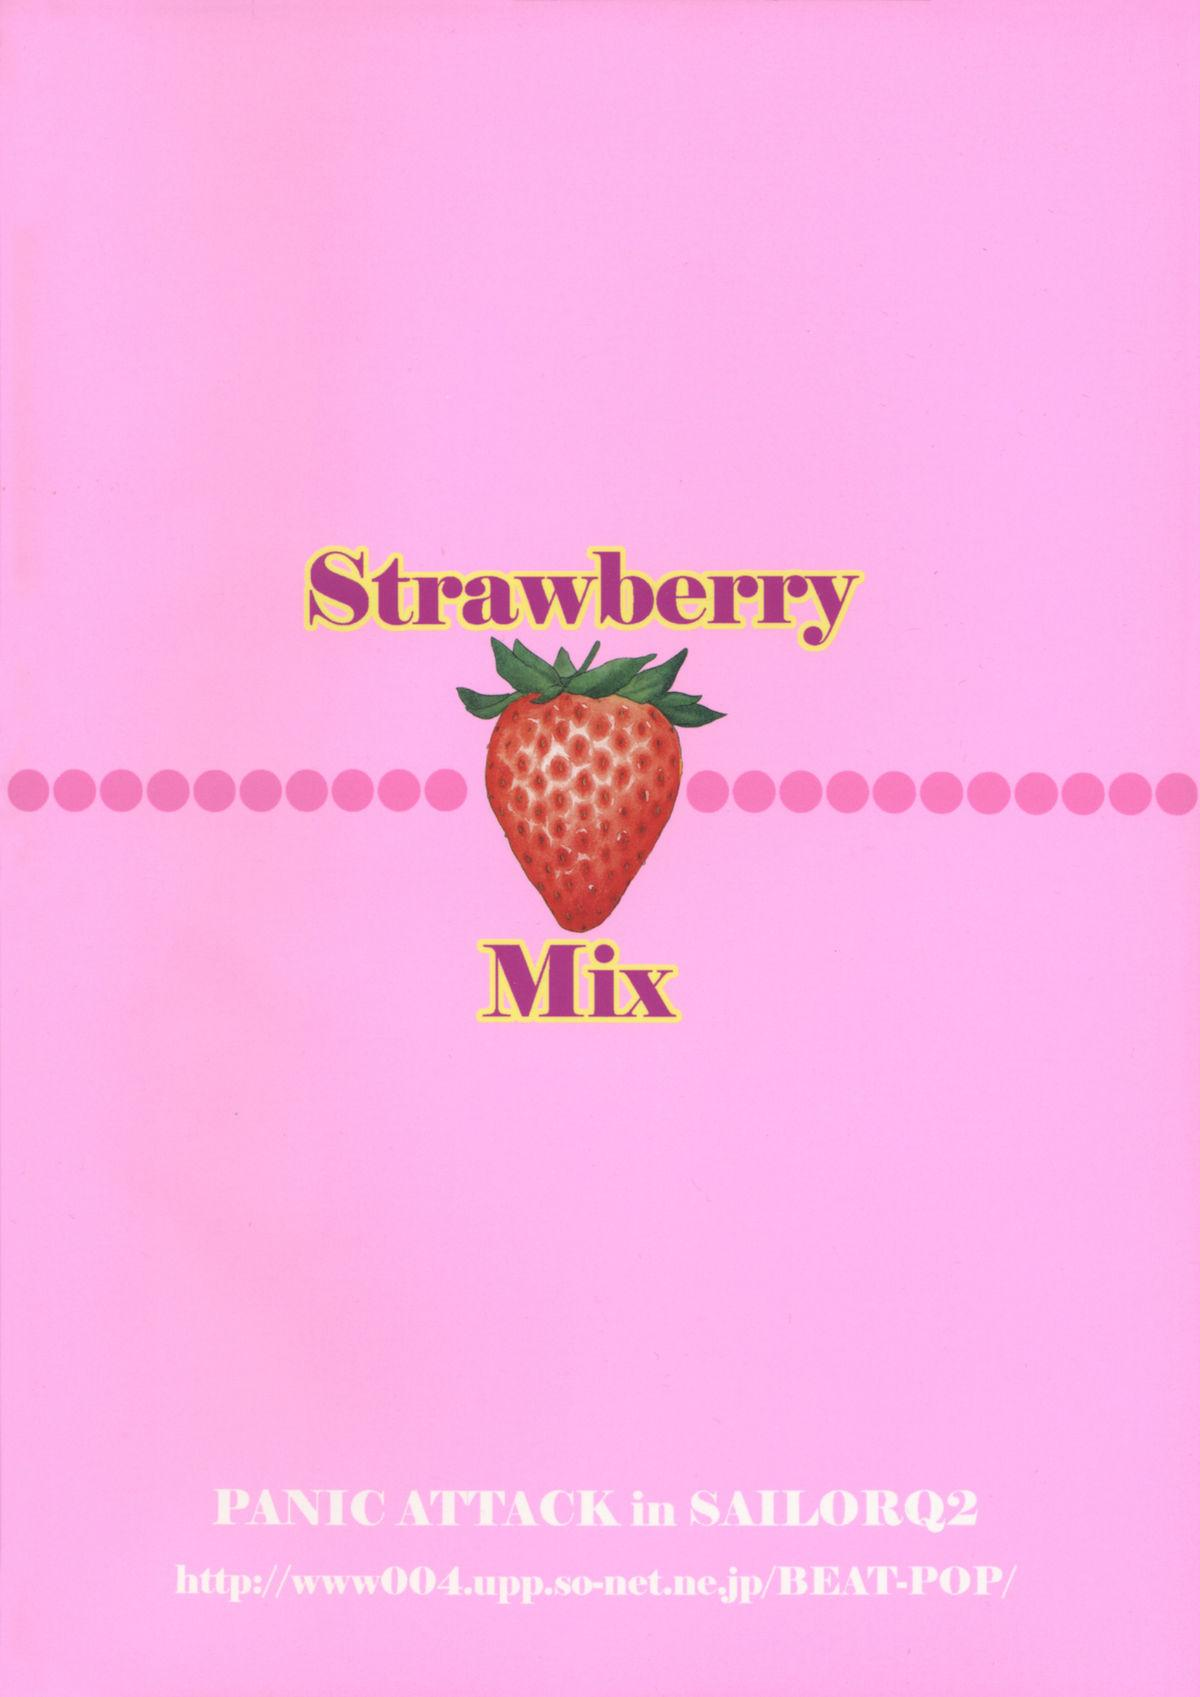 Strawberry MIX 30